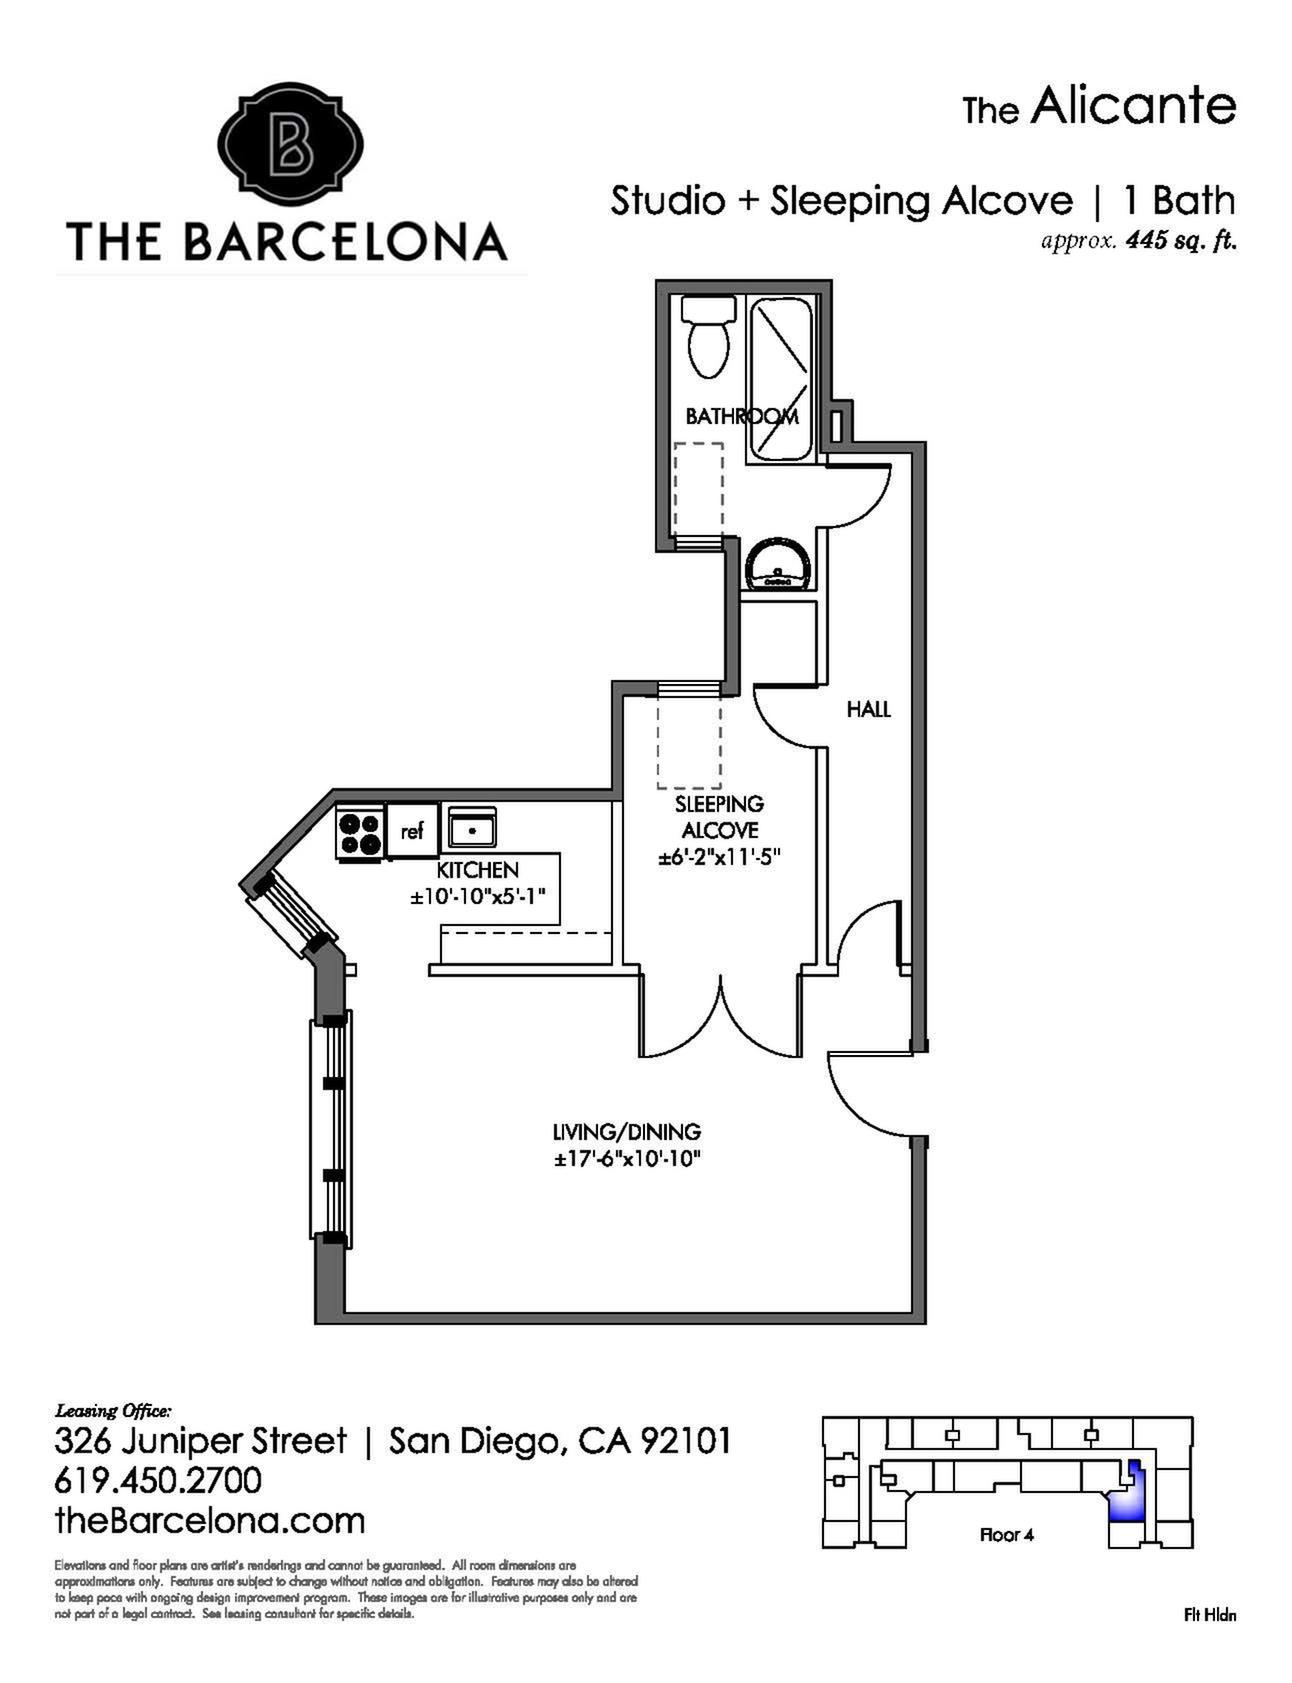 The Barcelona